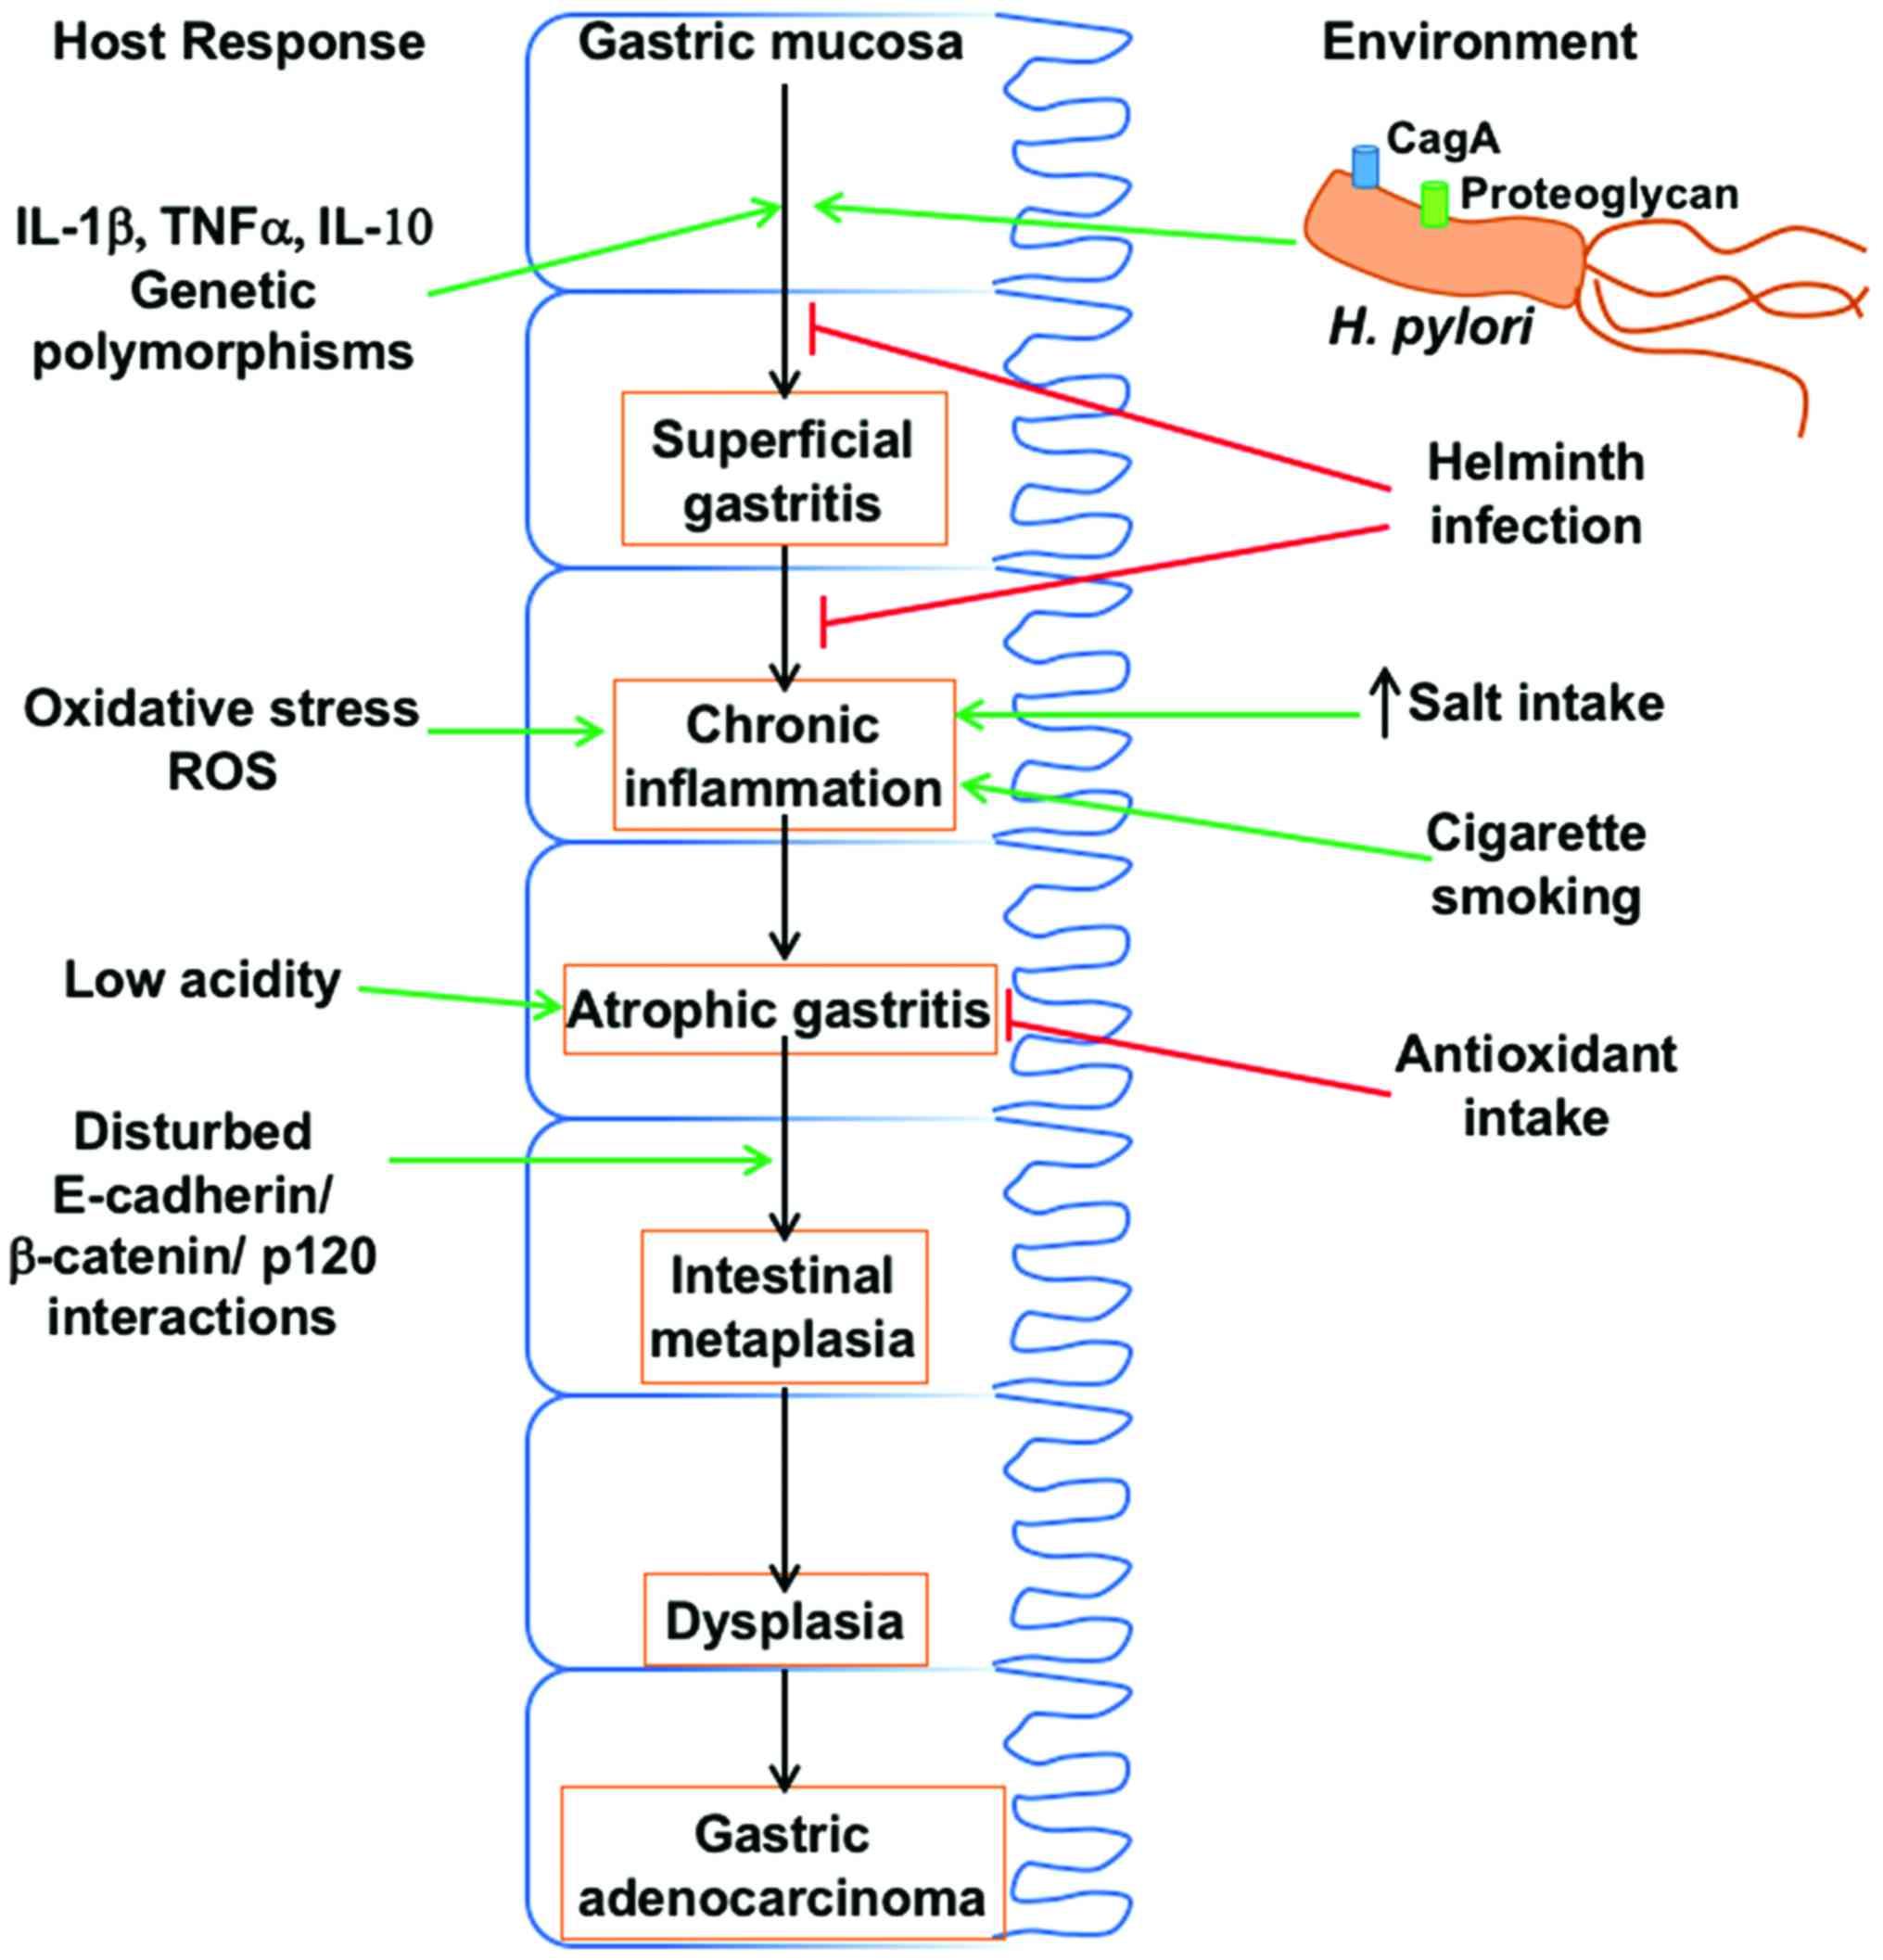 Endometrial cancer pembrolizumab. Helminths and immune modulation - Endometrial cancer pubmed